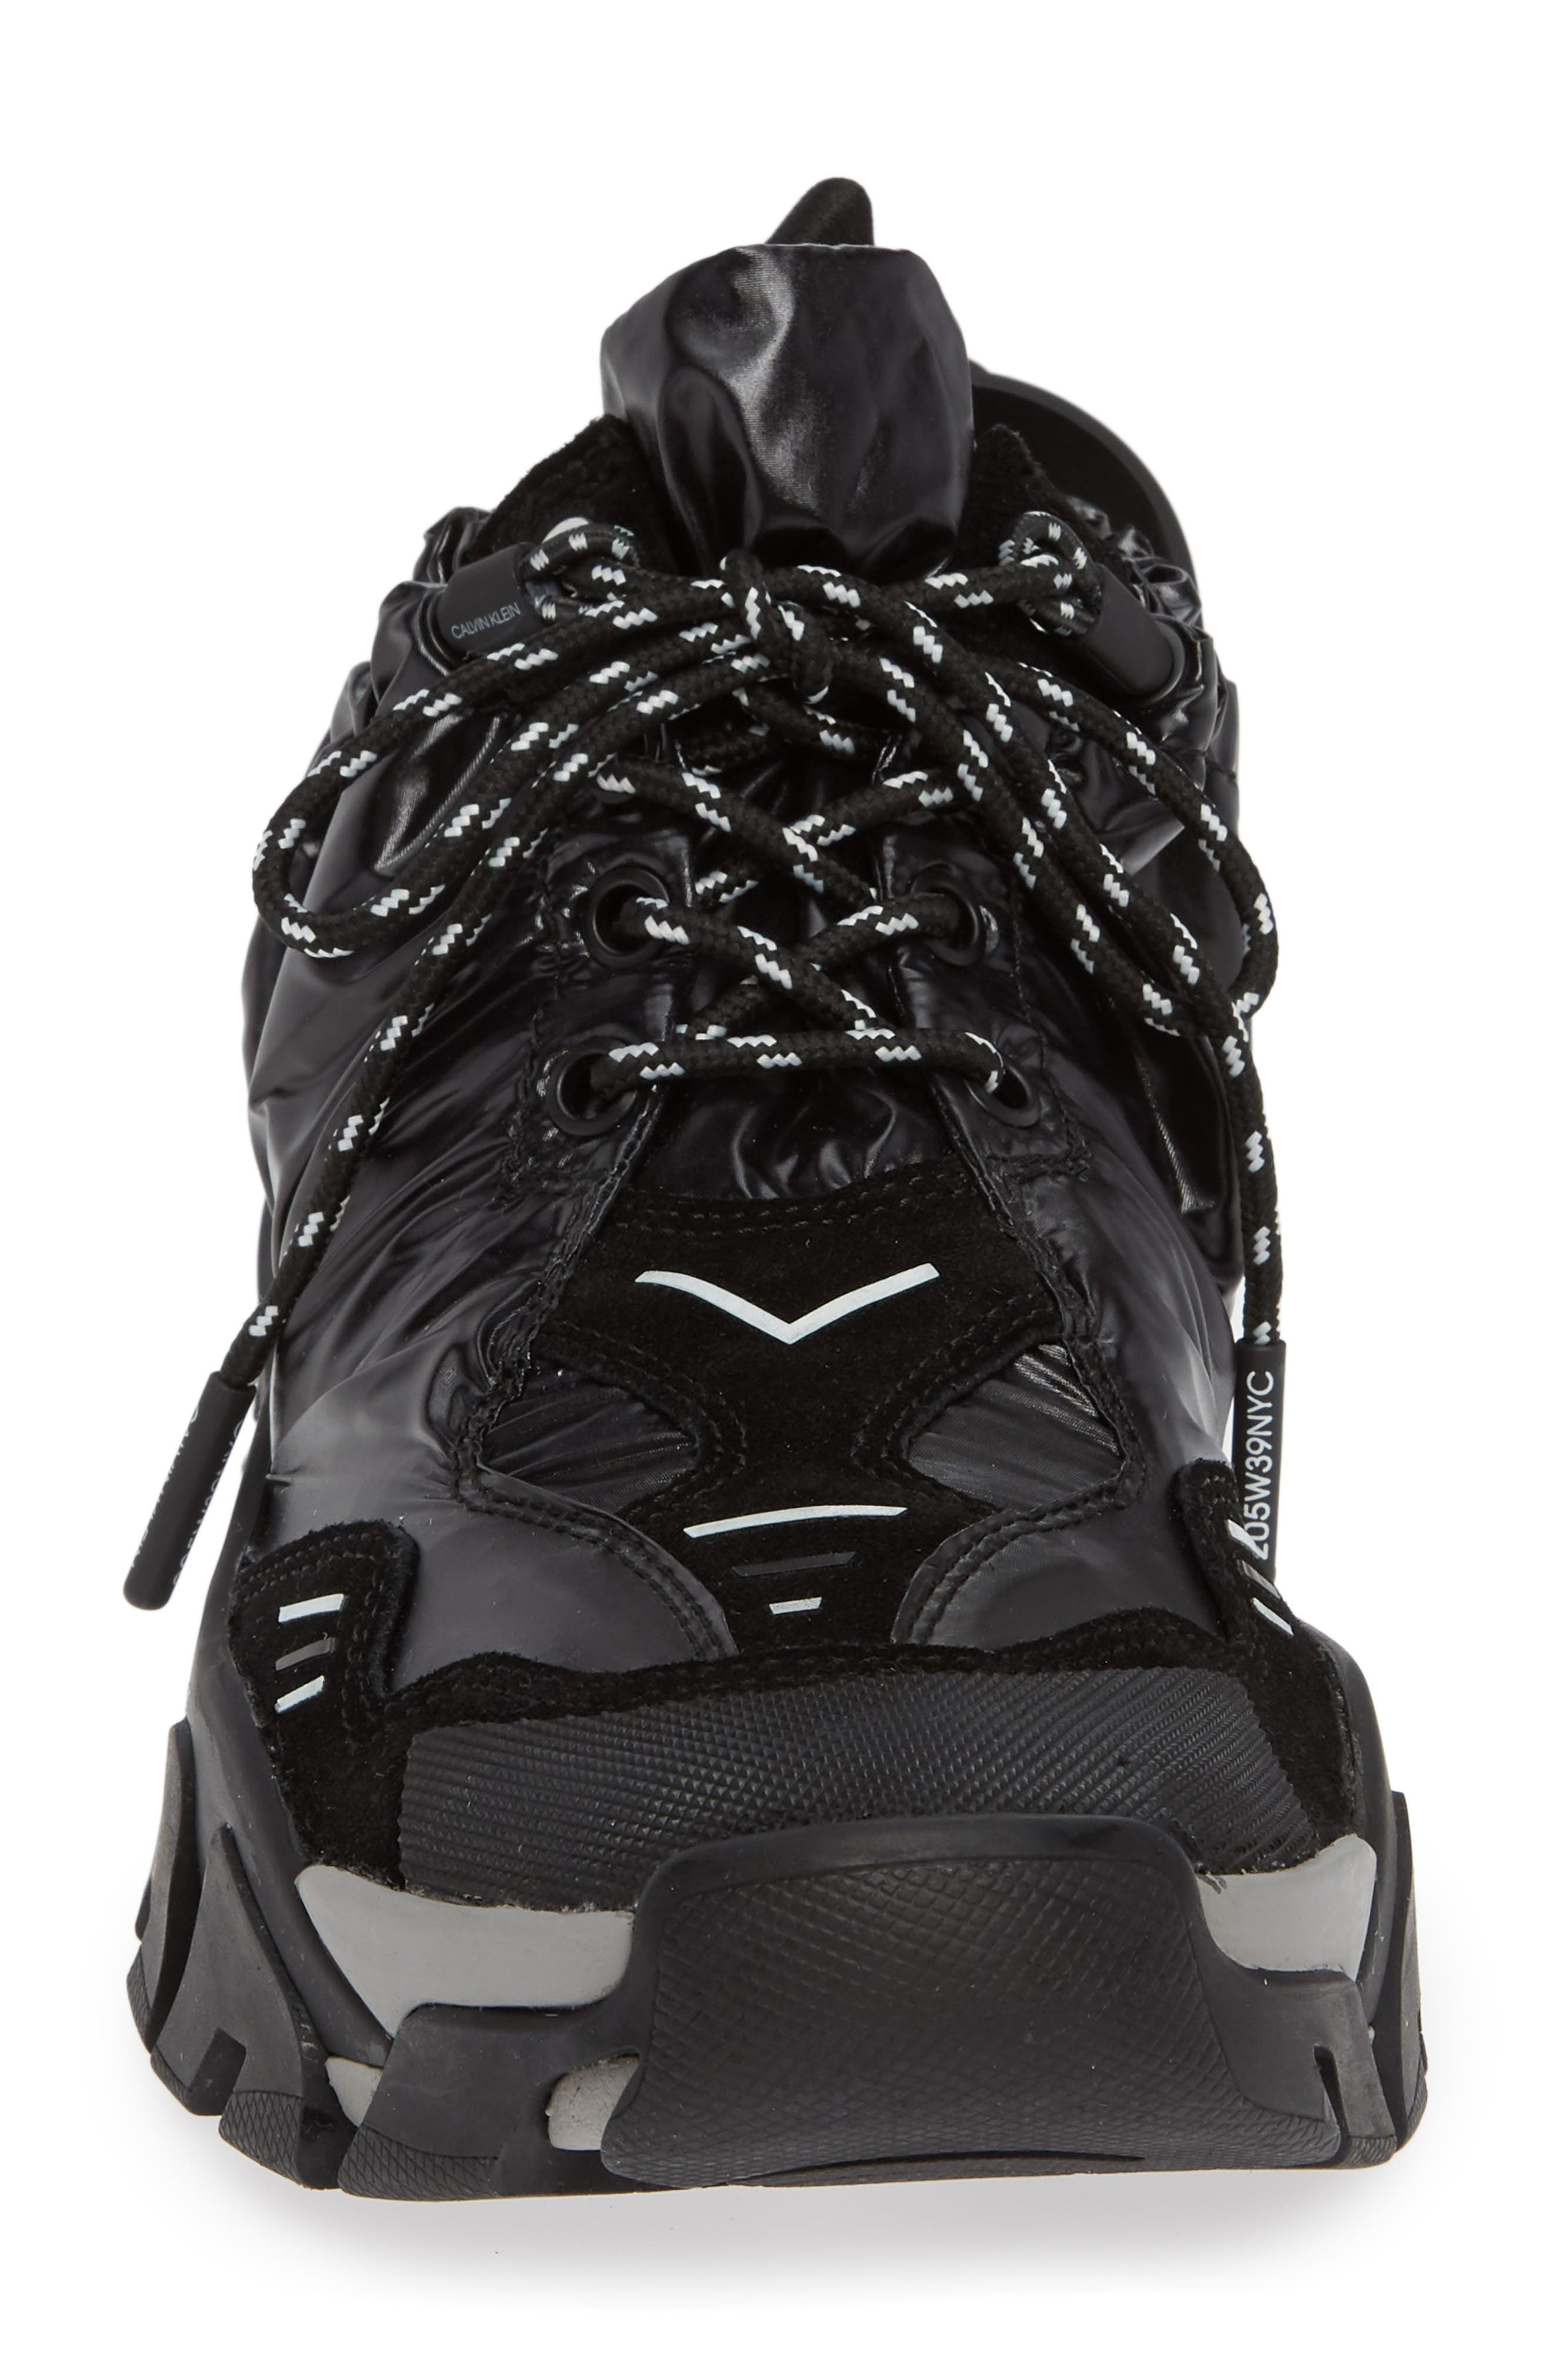 Carsdat 10 Elastic Sneaker,                             Alternate thumbnail 4, color,                             BLACK